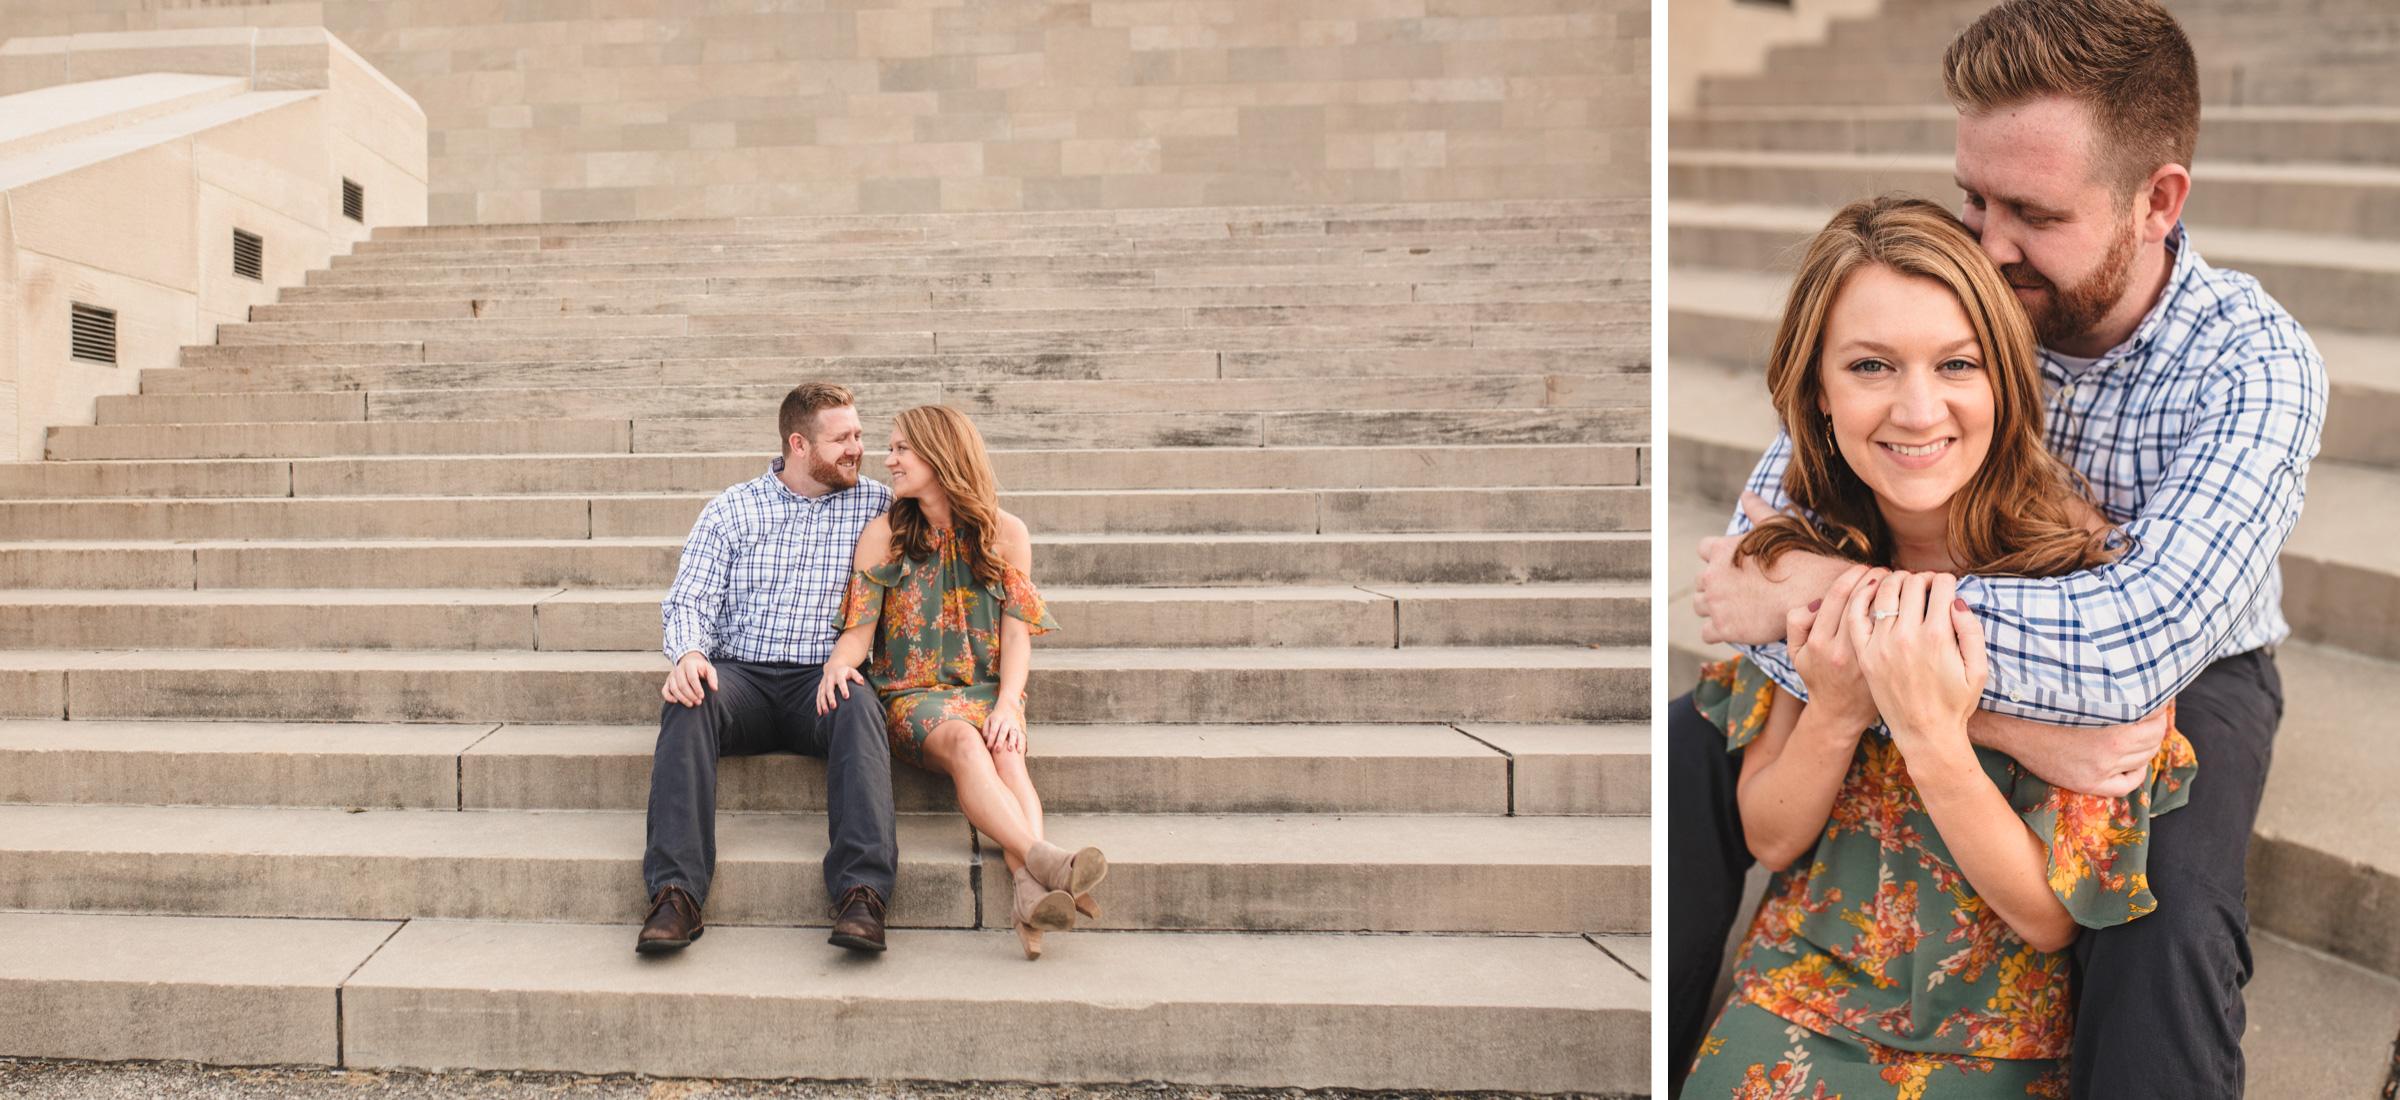 Urban_KC_Engagement_Anthony_Rachel_Kelsey_Diane_Photography_6.jpg